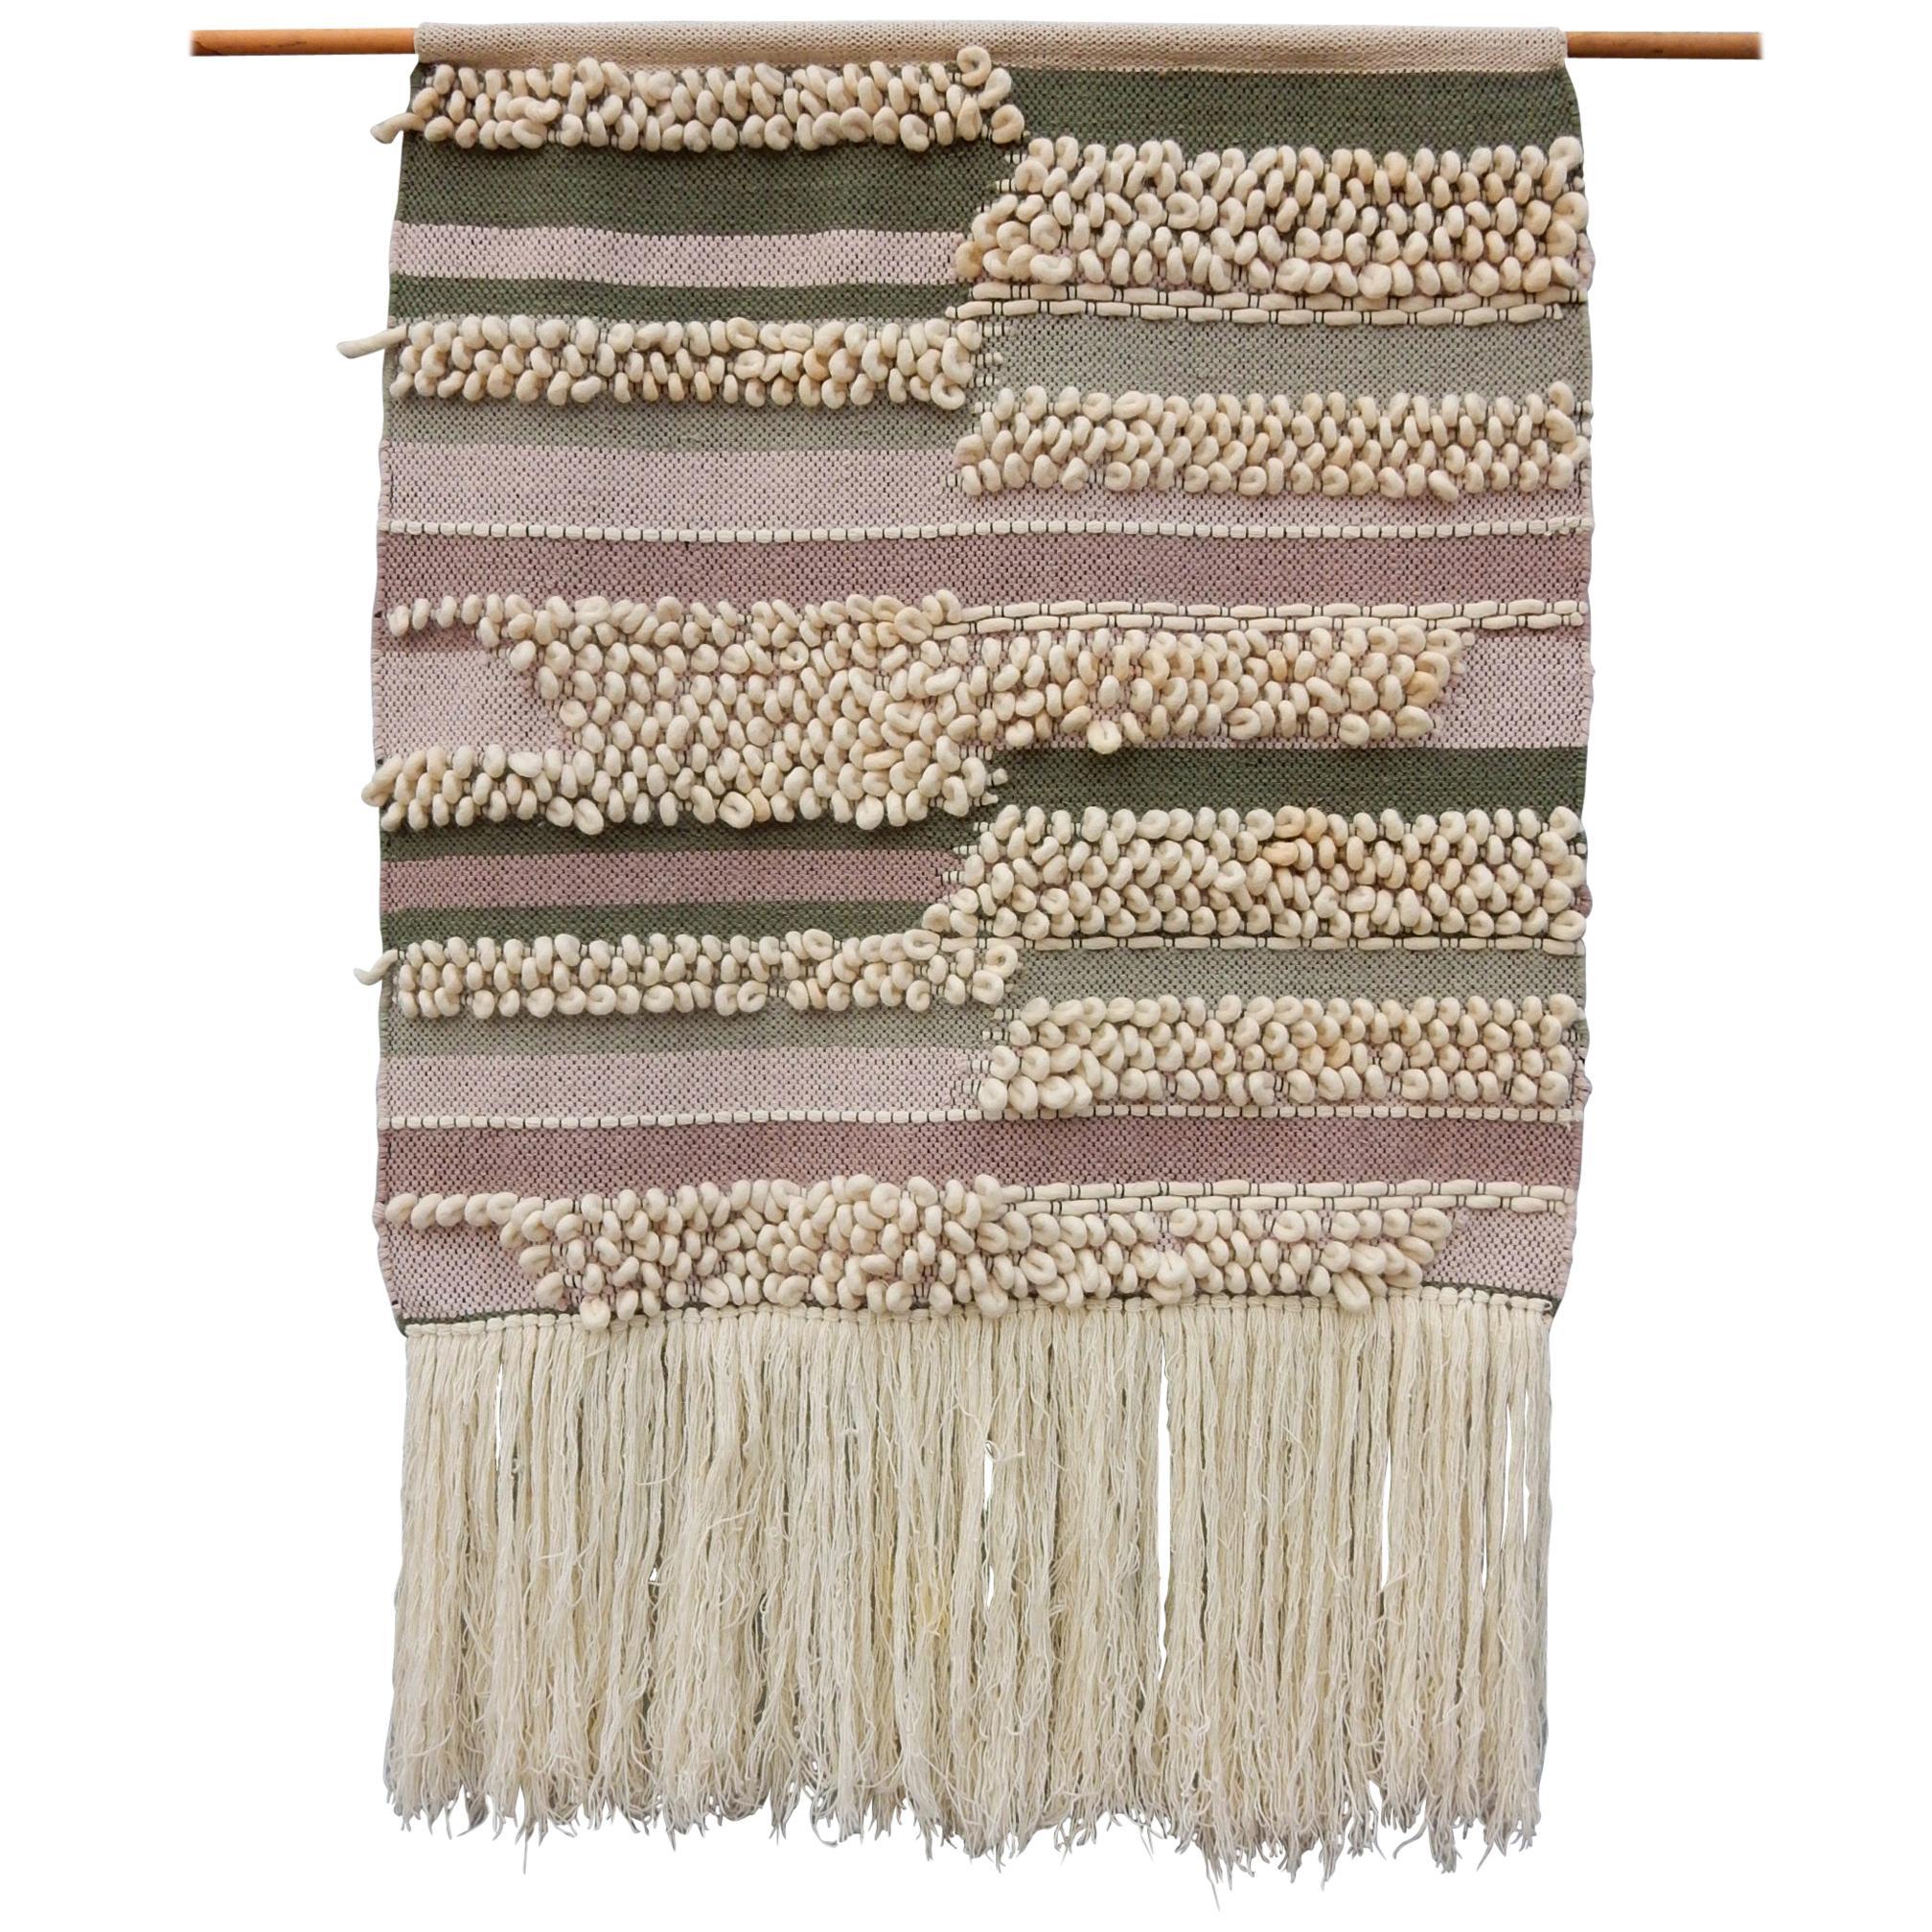 Large Vintage Wool Textile Fiber Art Wall Tapestry